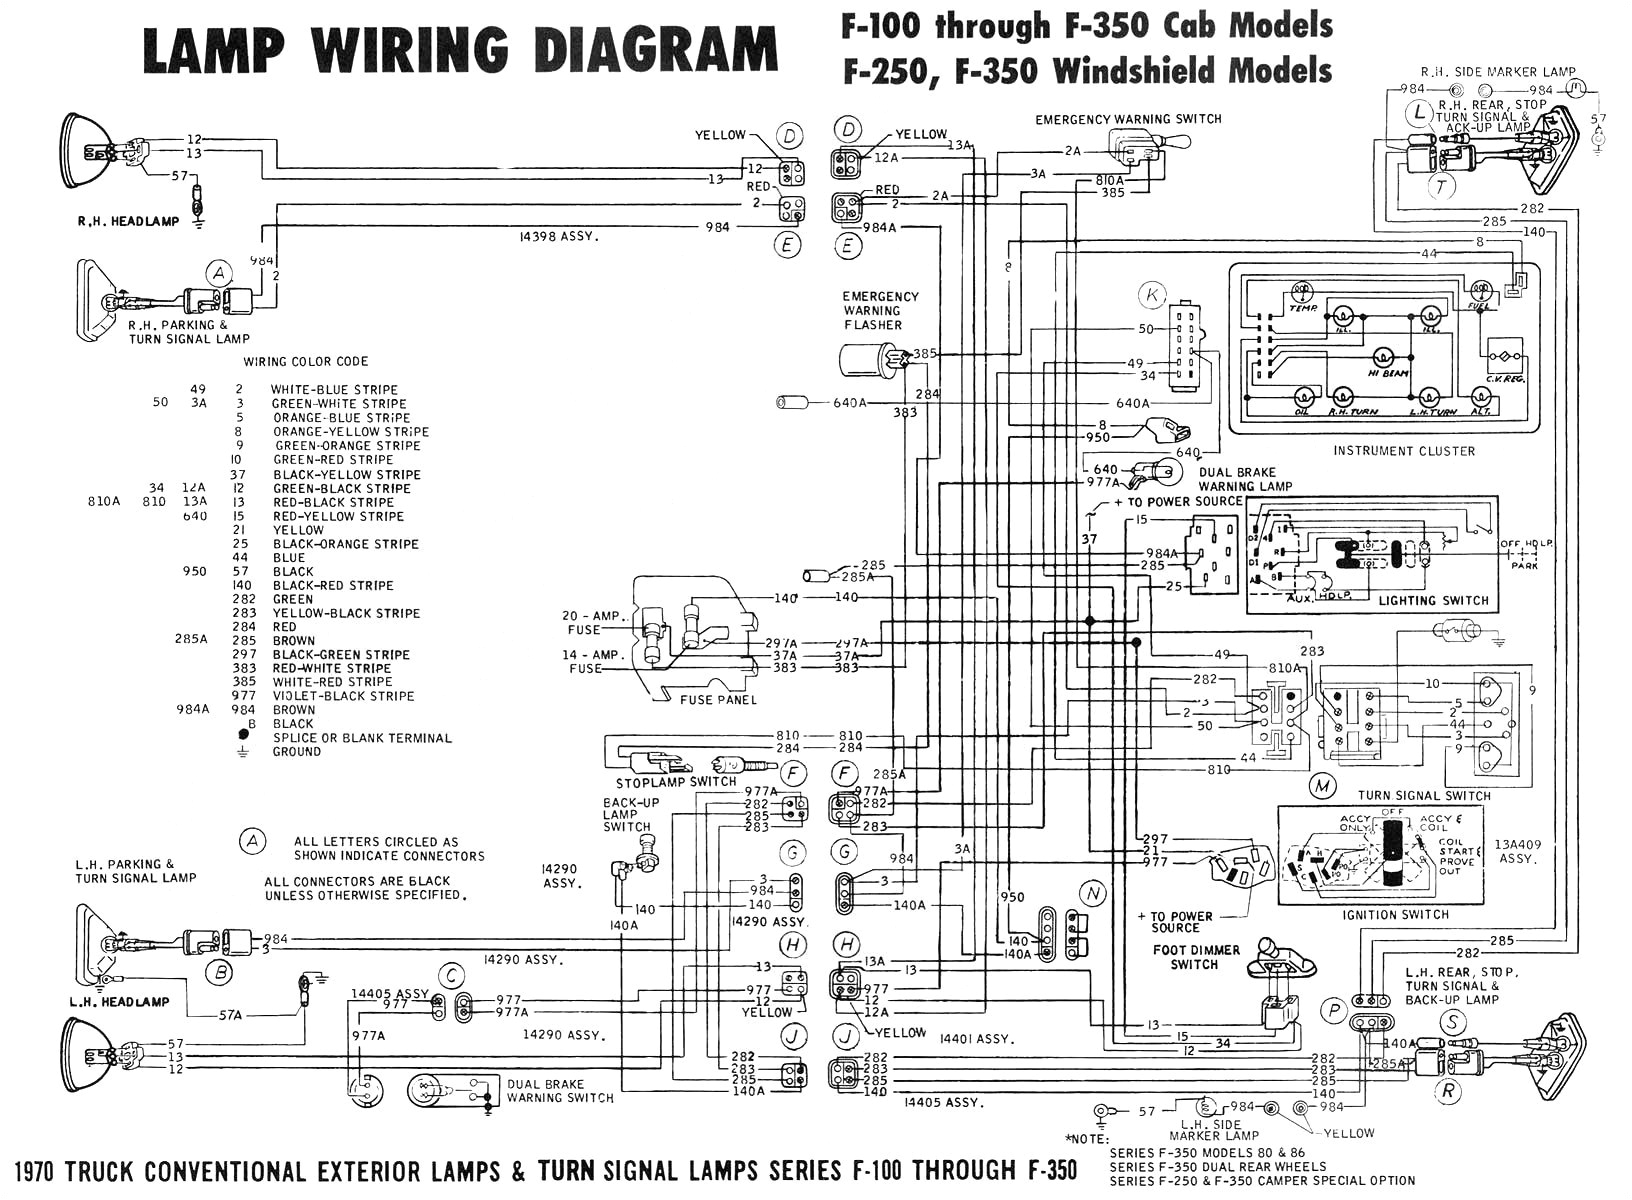 navigation light kit diagram wiring diagram blog wire diagram for trailer light kits wire circuit diagrams